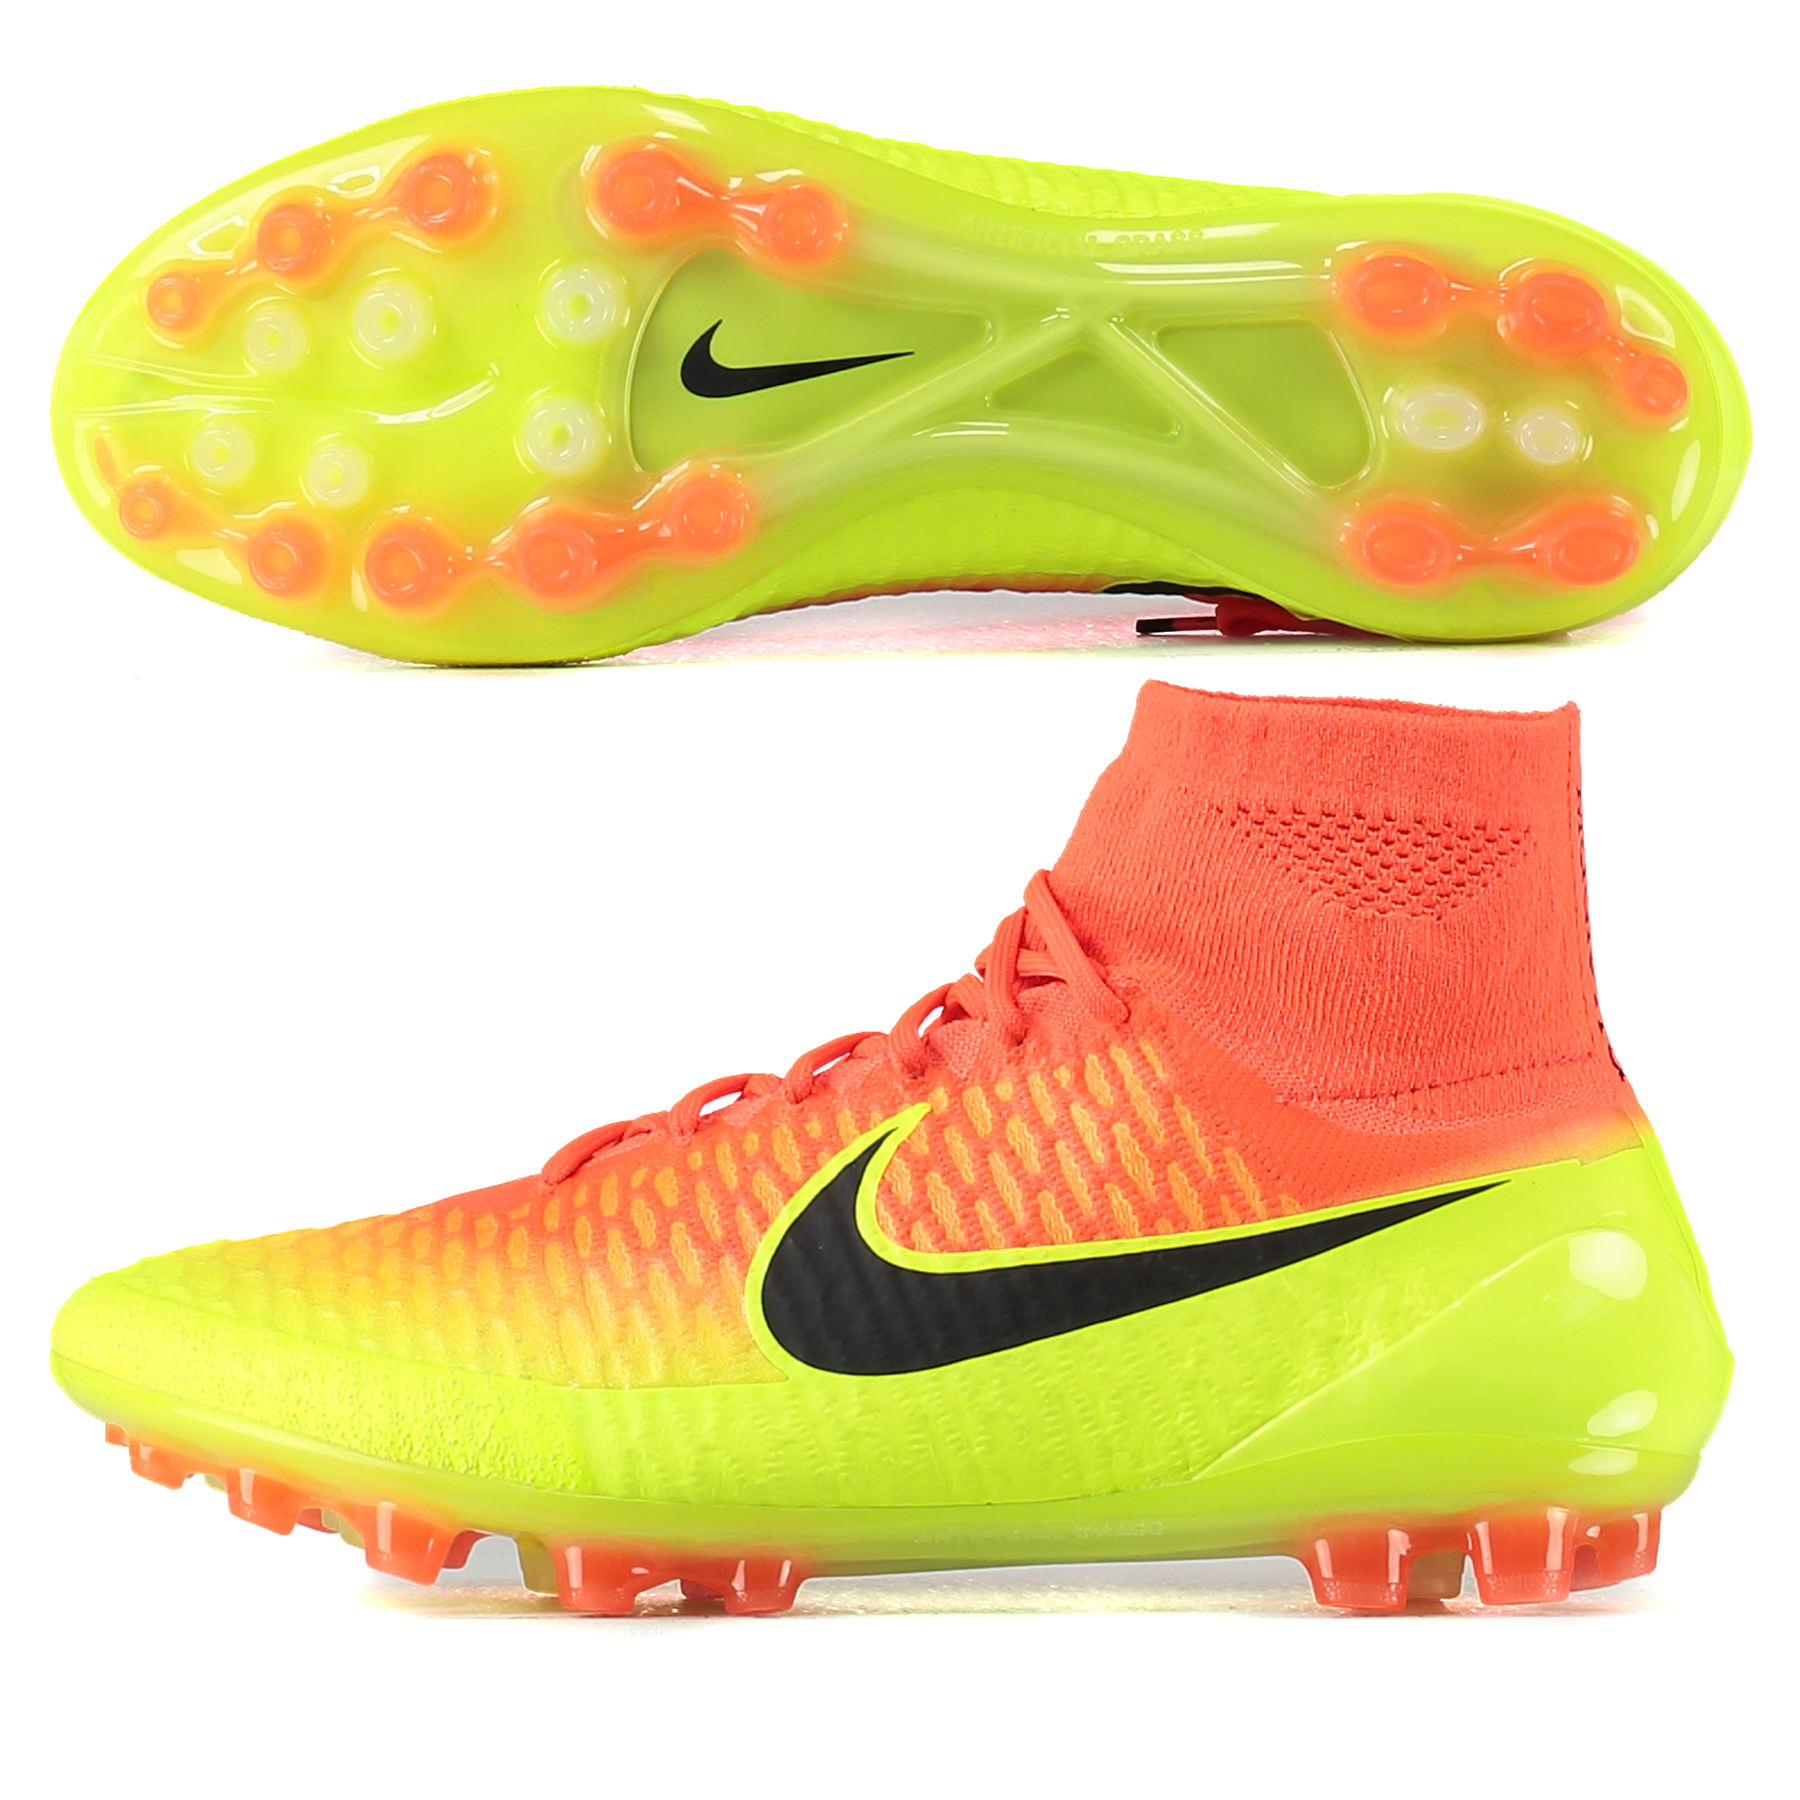 Nike Magista Obra Artificial Grass Football Boots - Total Crimson/Blac